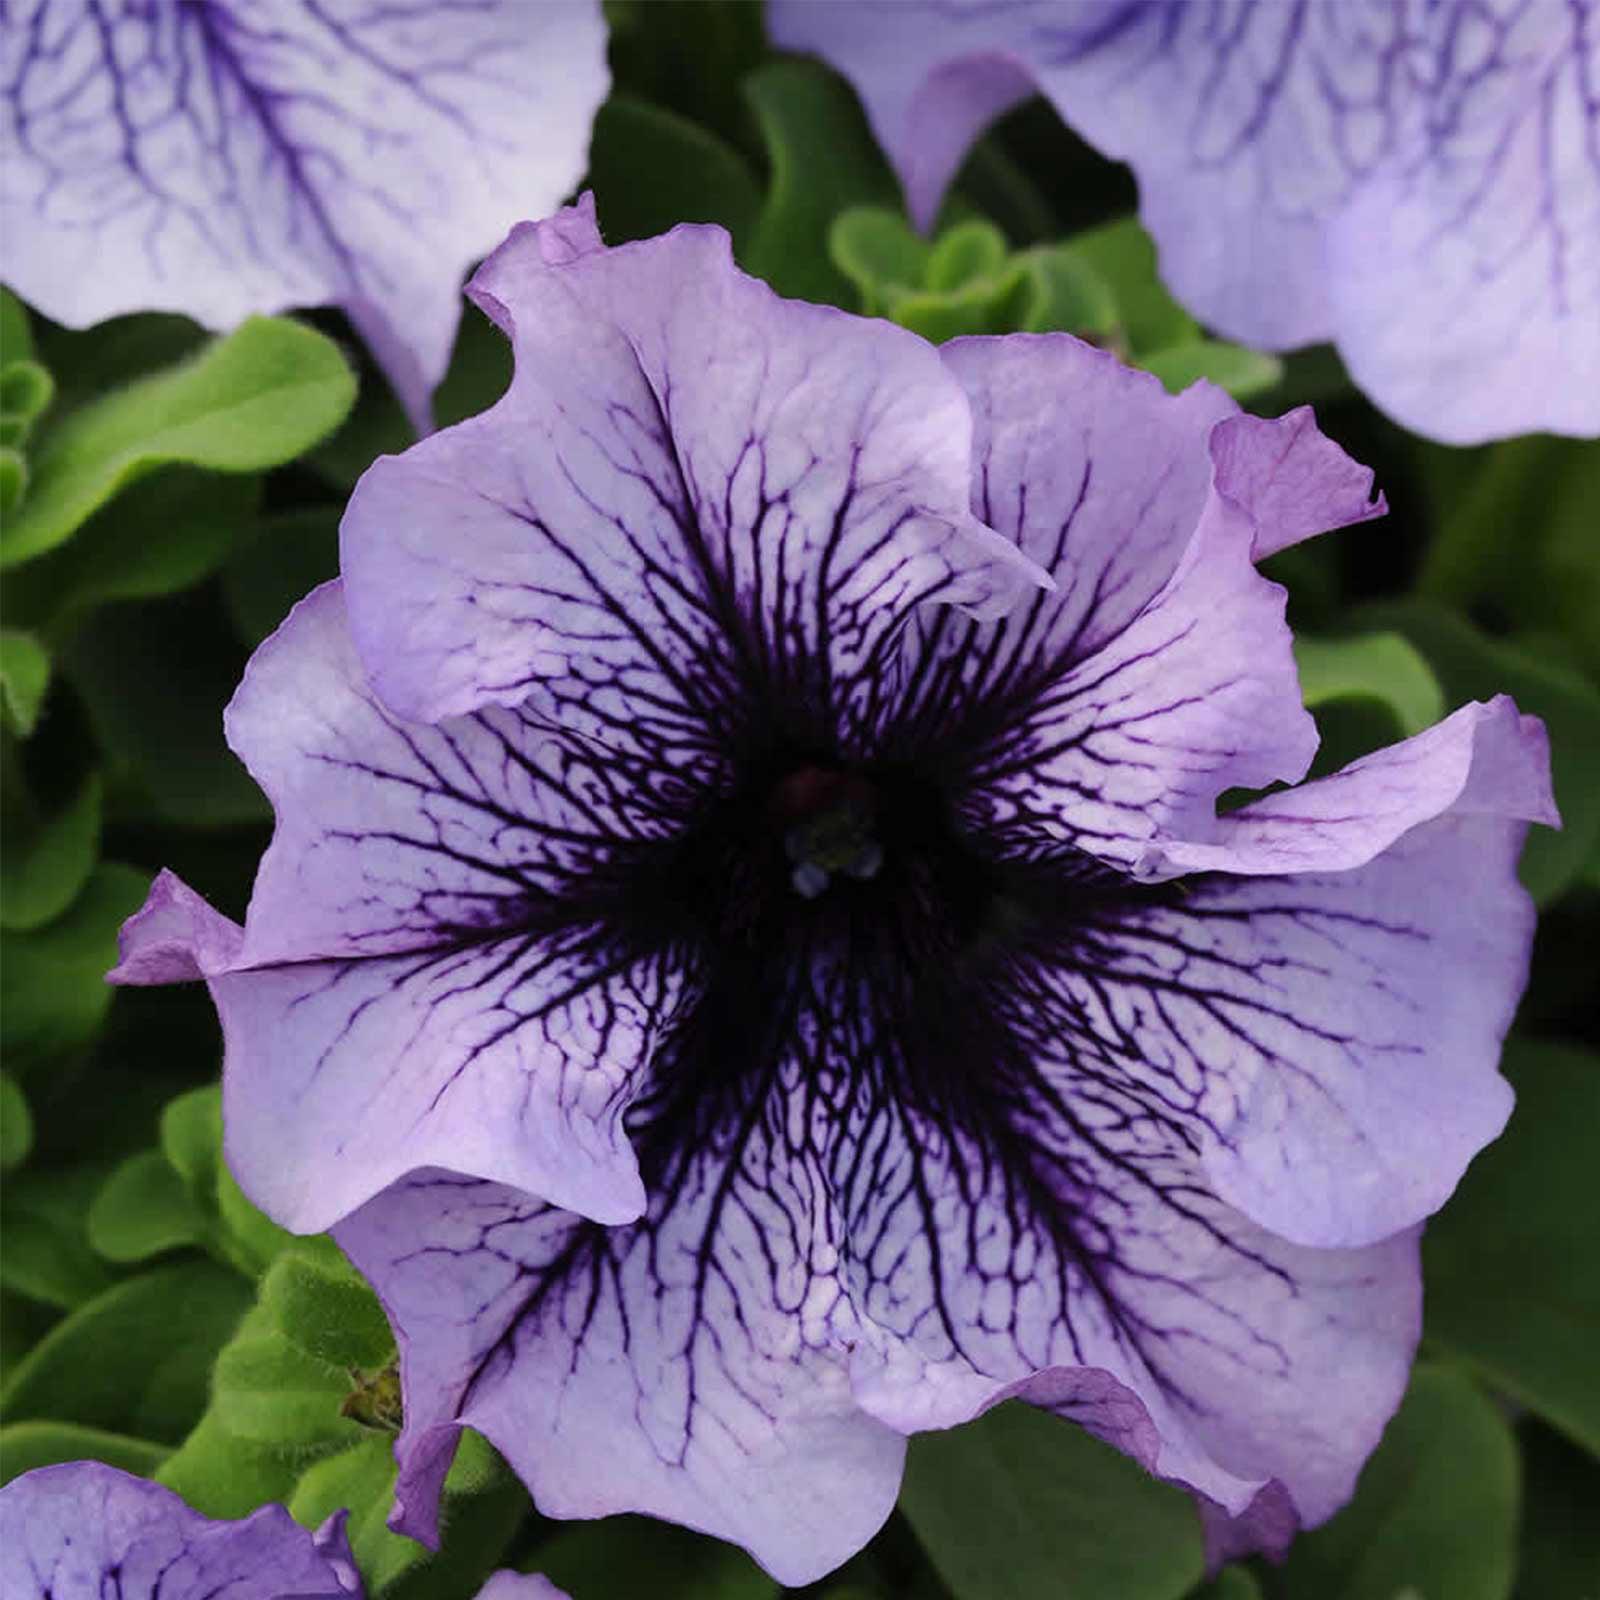 Petunia - Daddy Series Flower Garden Seed - 1000 Pelleted Seeds - Peppermint Color Blooms - Single Grandiflora Petunias - Annual Flowers